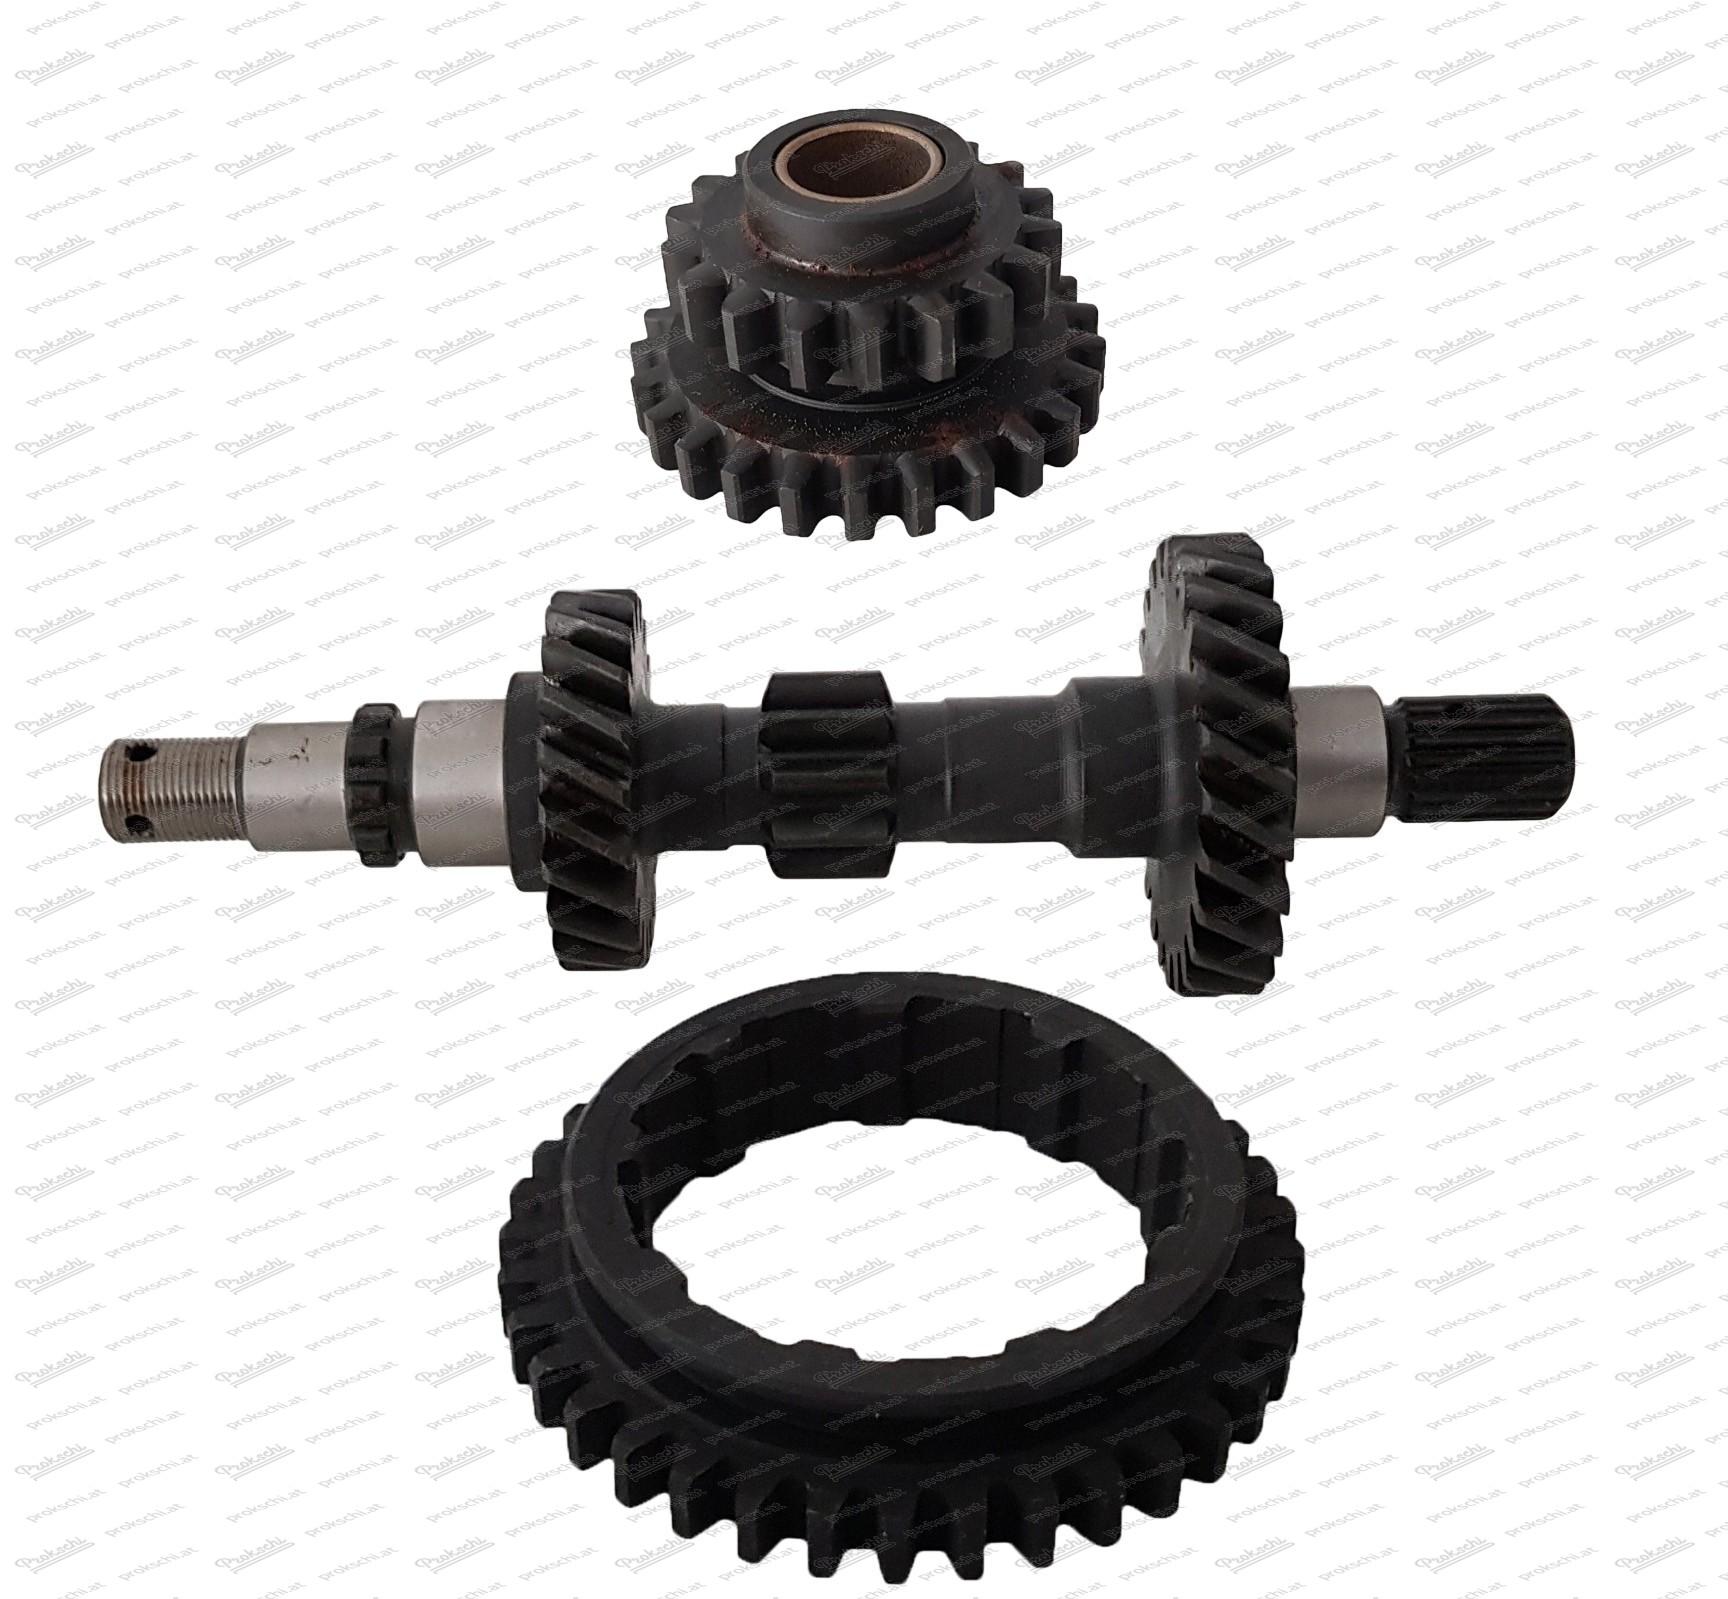 Reparatursatz Getriebe - 1.Gang und Rückwärtsgang Fiat 500 N-D-F-L